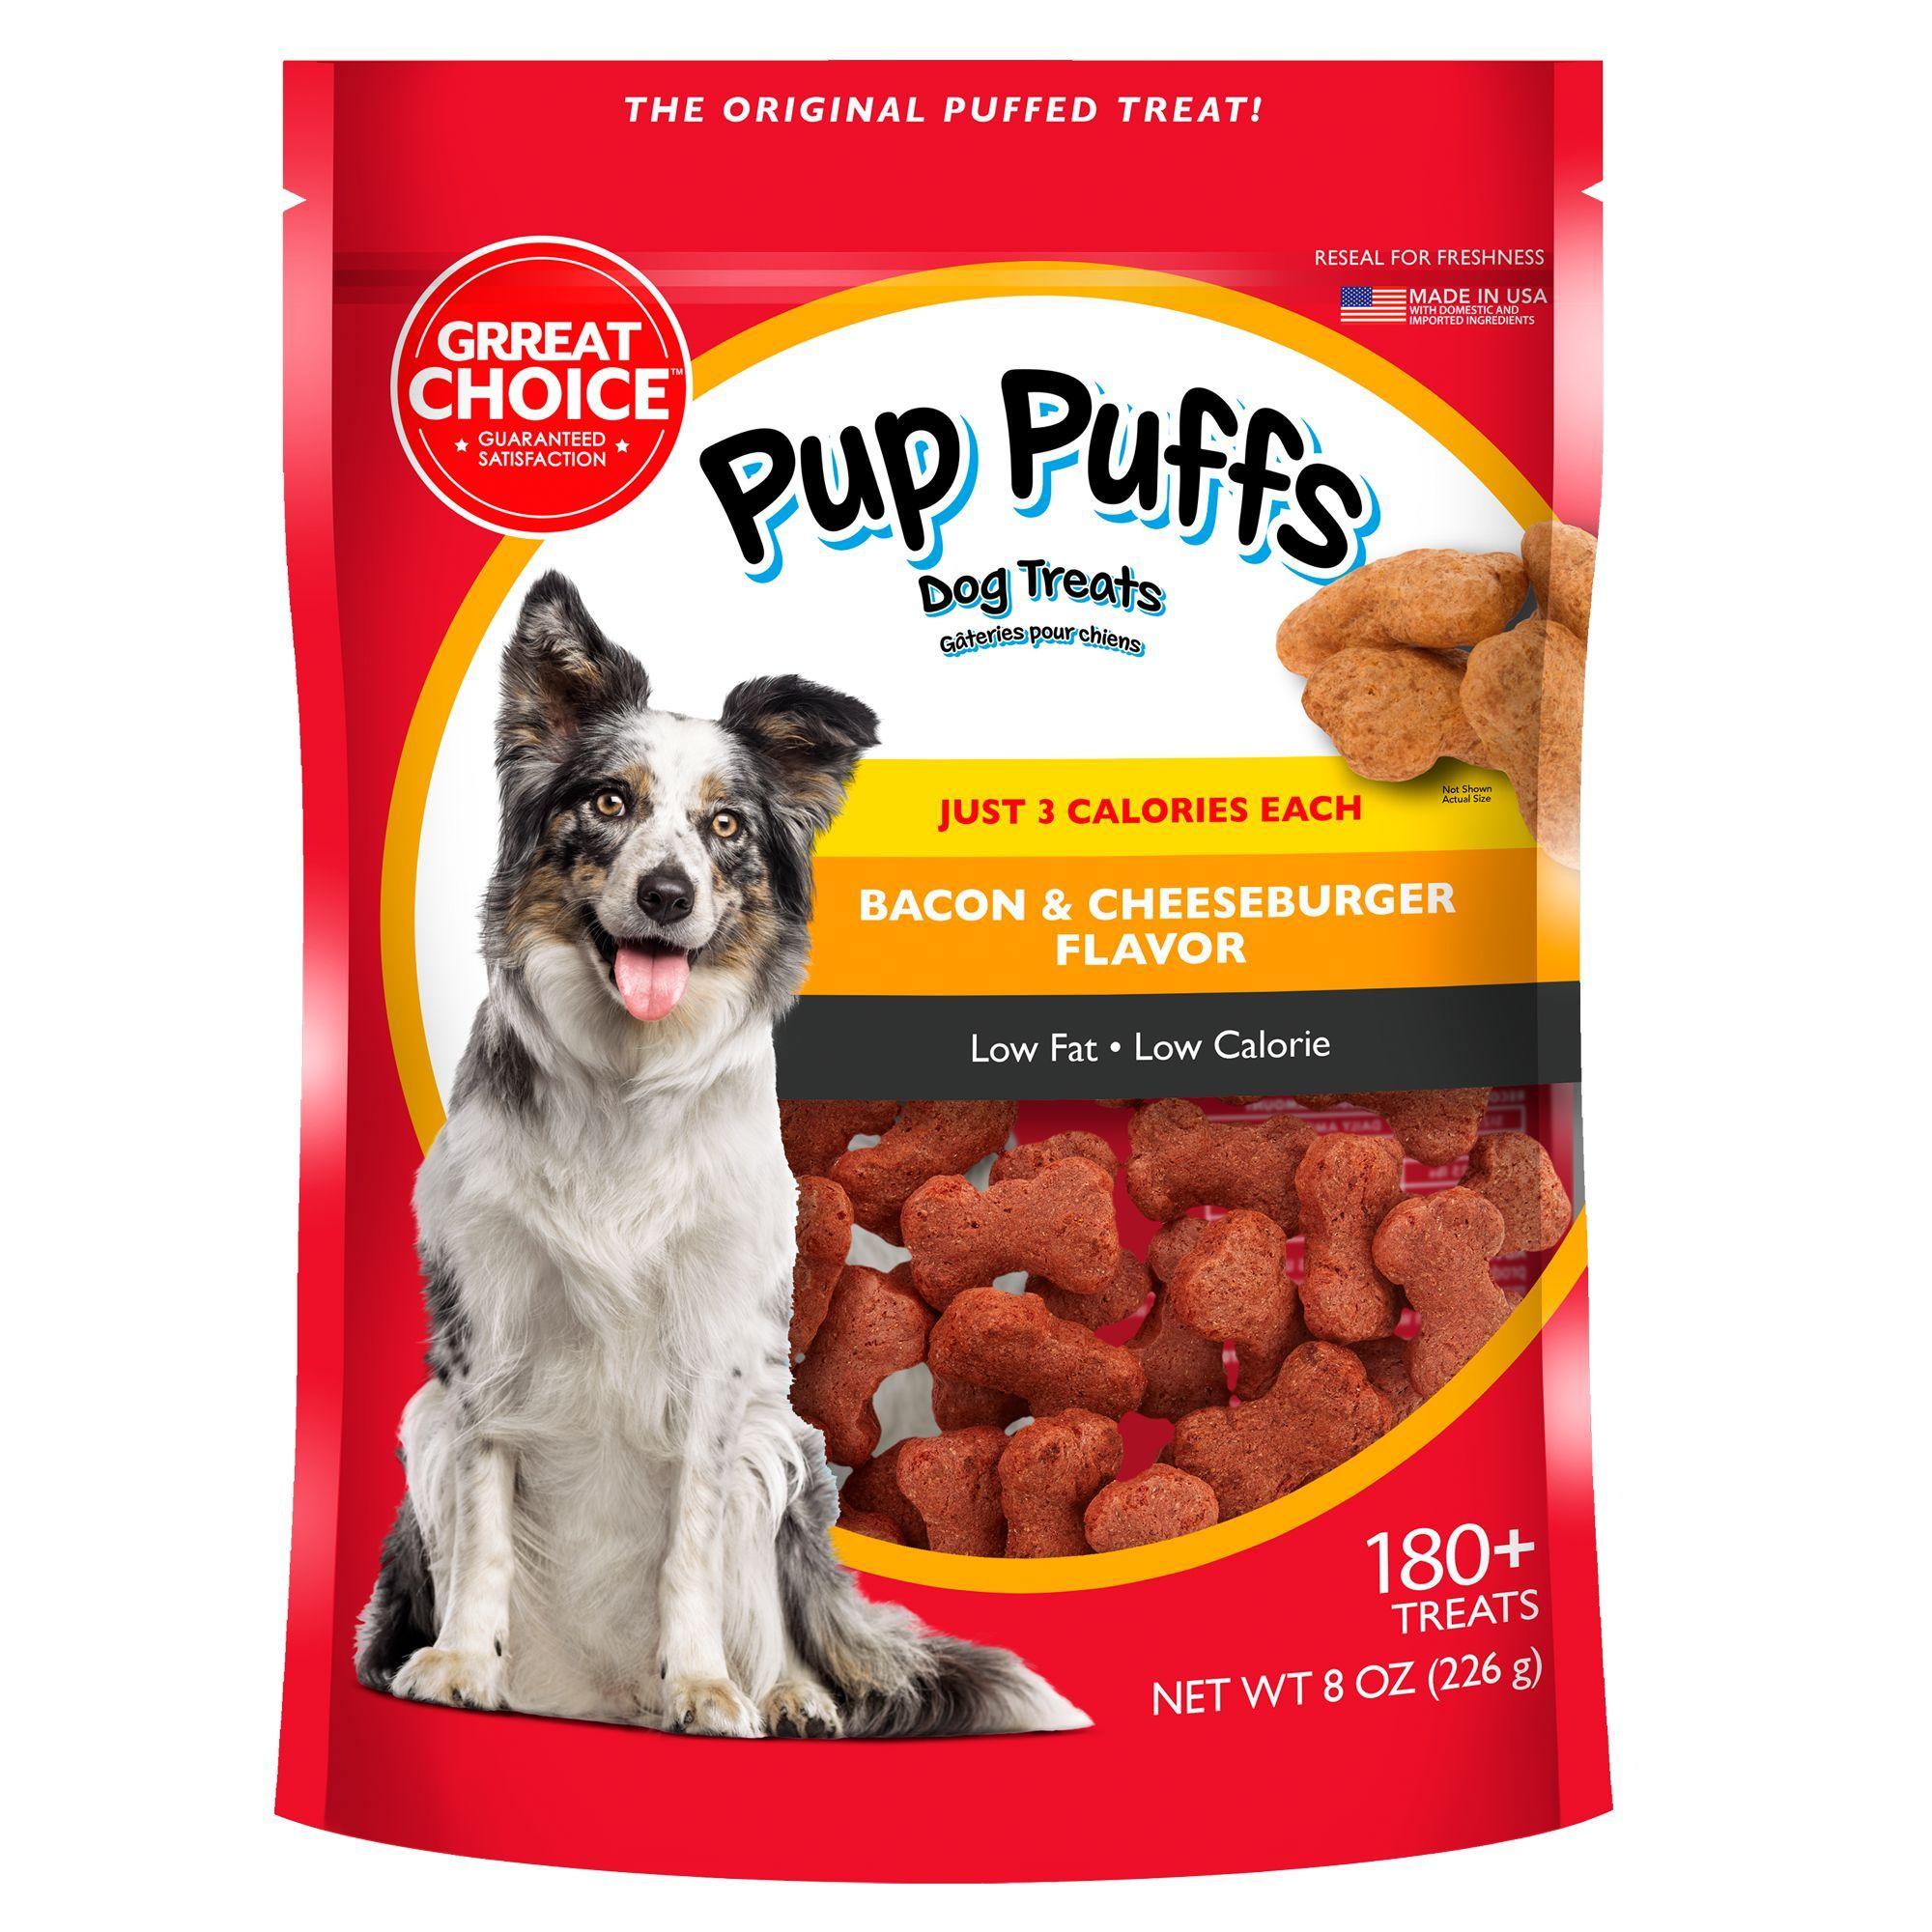 Grreat Choice Pup Puffs Dog Treats Size 8 Oz Great Choice Blue